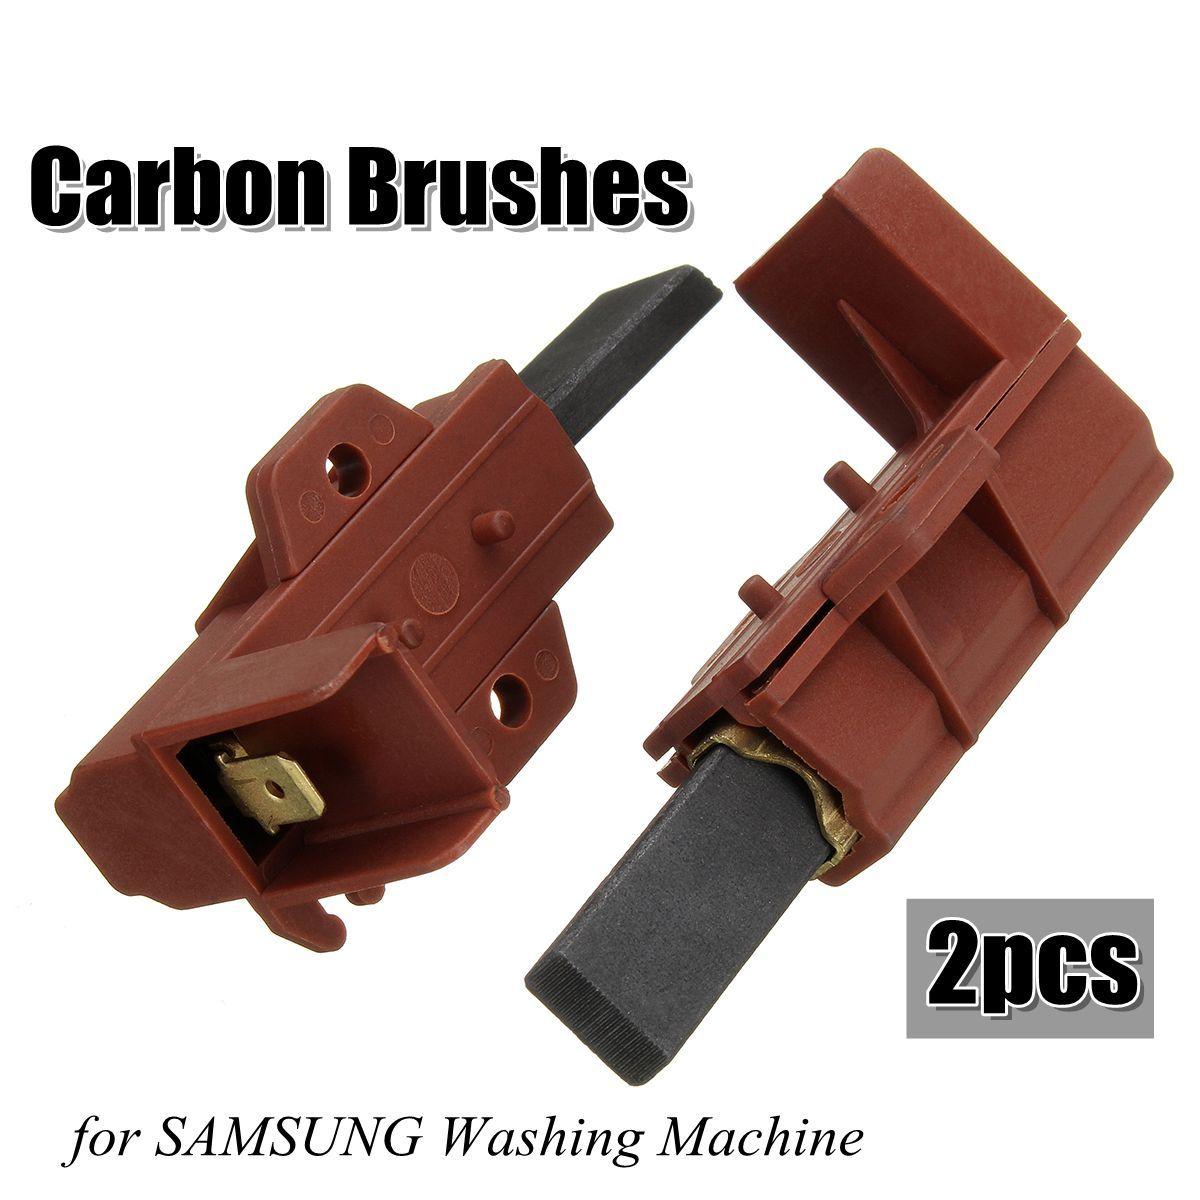 2pcs Washing Machine Motor Carbon Brush And Holder For Samsung Ariston Indesit Welling Stiralnaya Mashina Transportnoe Sredstvo Motocikl